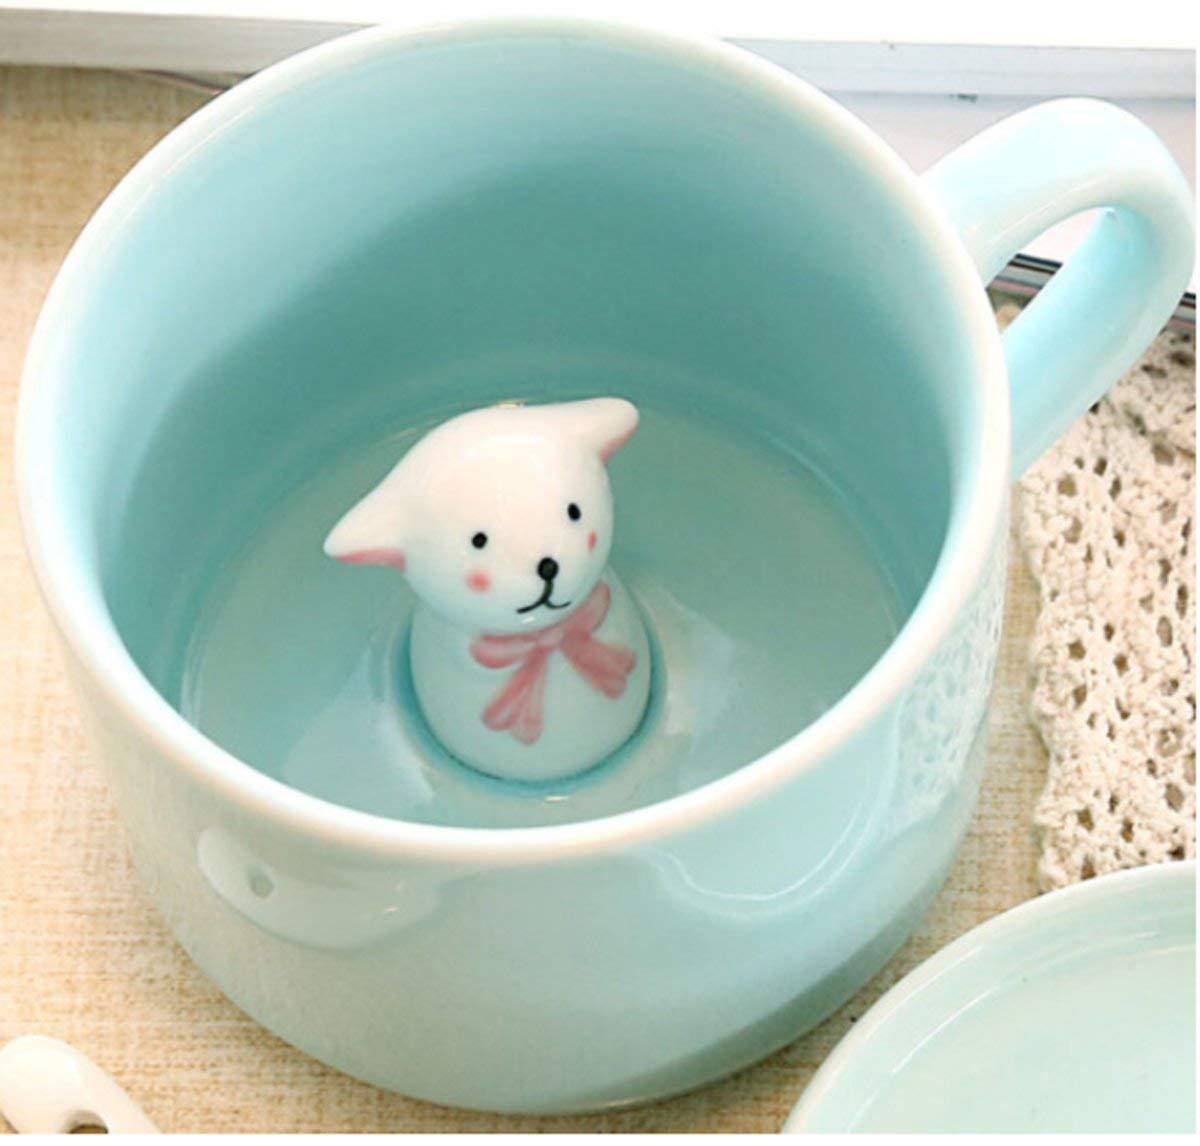 3dコーヒーマグCute Cartoon Animal Ceramics Cup – ベビー動物内側、Best Office Cup &誕生日ギフト8 oz [並行輸入品] (baby mouse) B07LBQ9PWD small sheep  small sheep